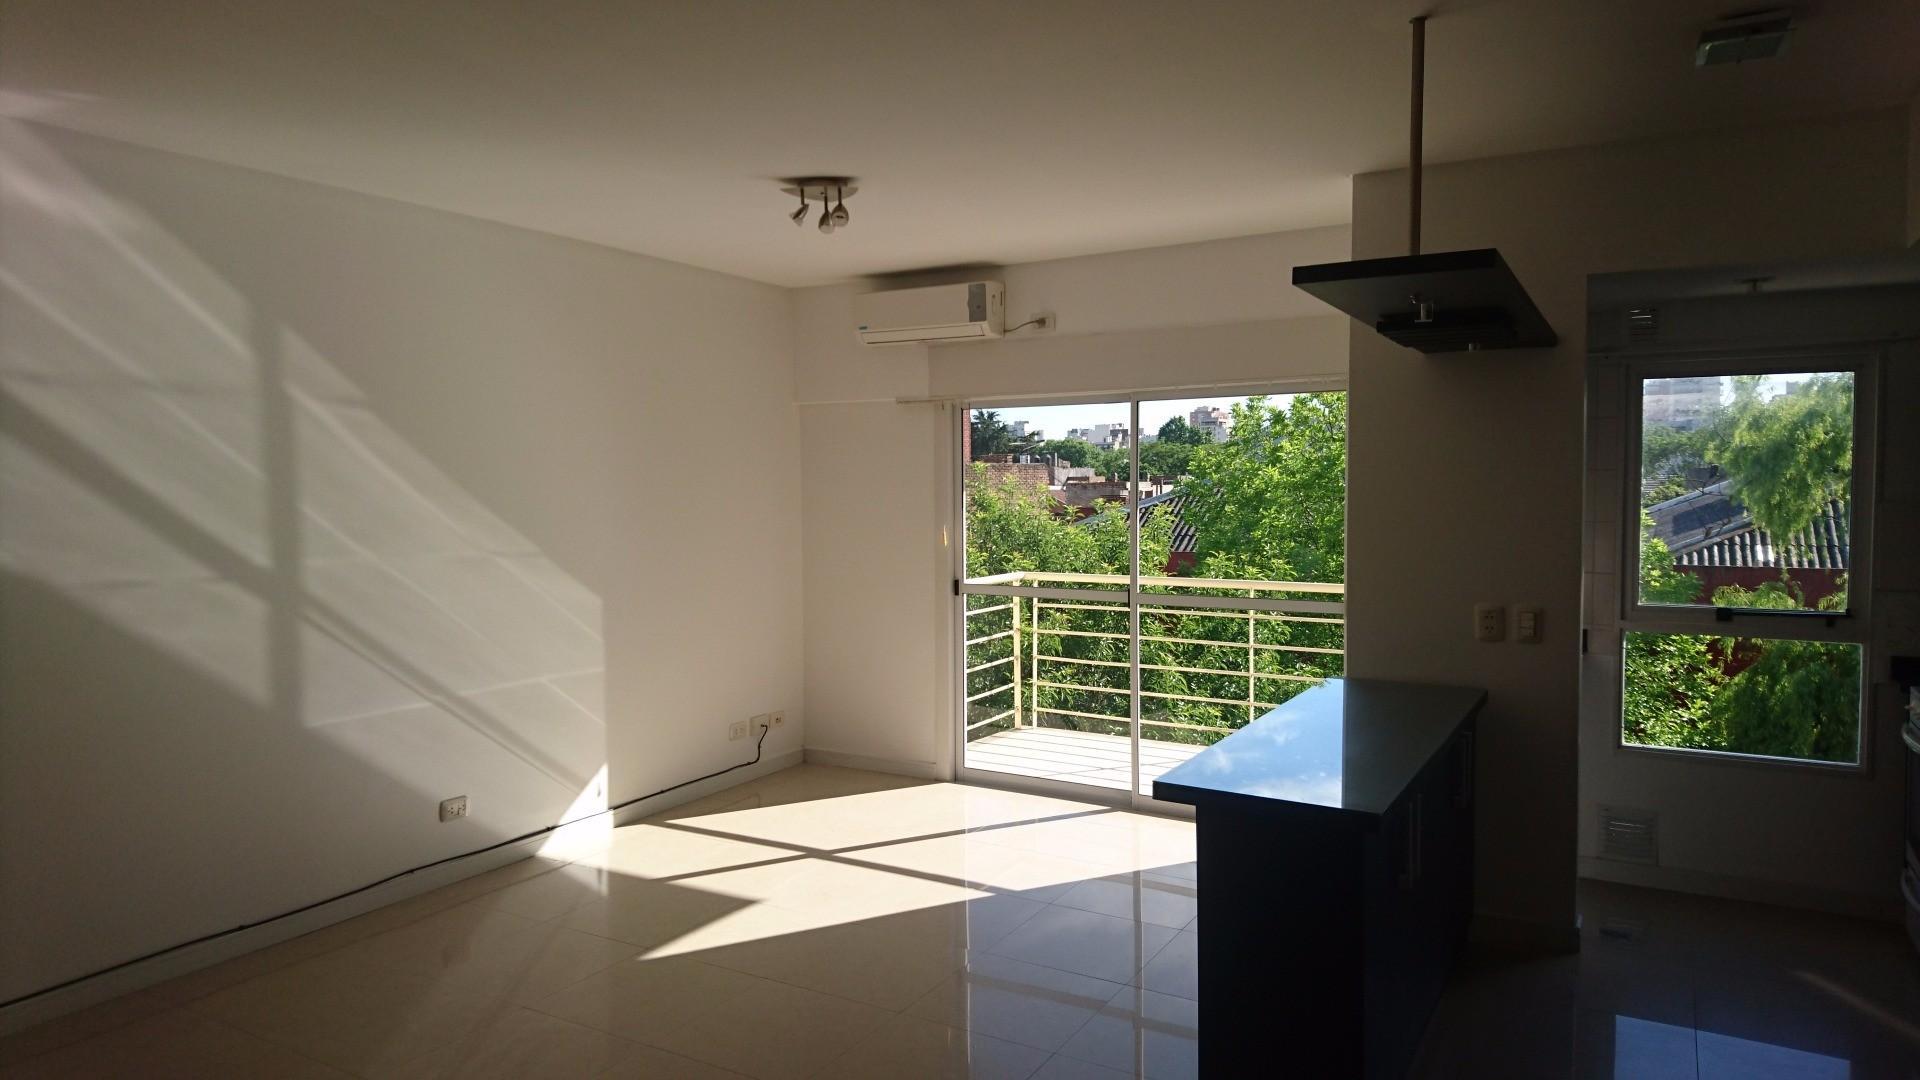 D. Cullen 5700 , 3° piso | DUEÑO DIRECTO | ESPECTACULAR SEMIPISO 2 AMBIENTES